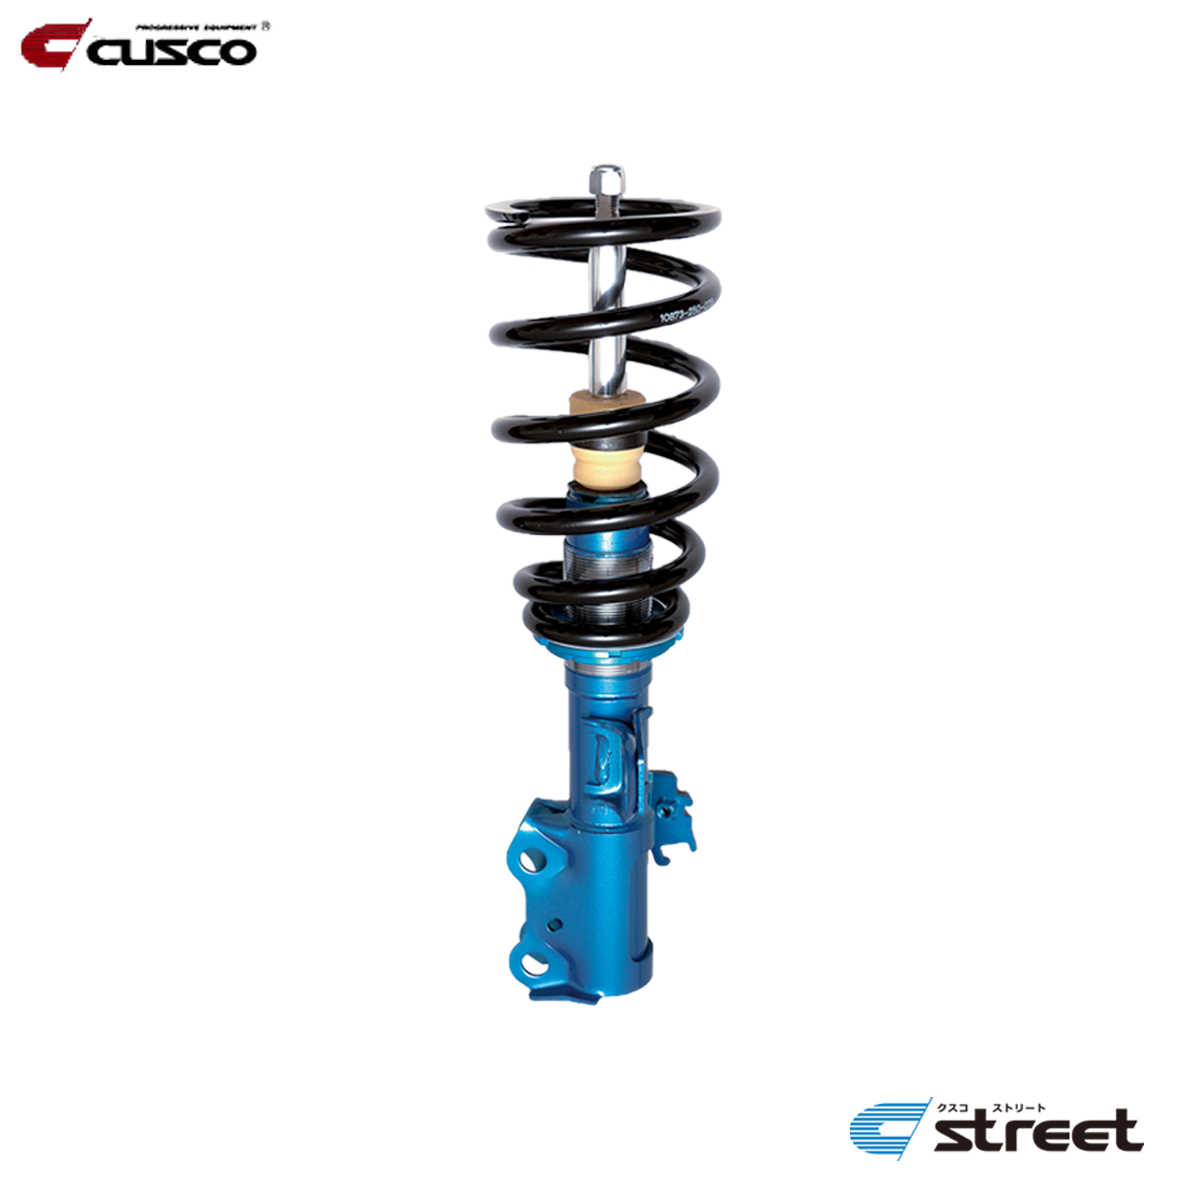 CUSCO クスコ アクア NHP10 車高調 全長固定式 901-62K-CBA ストリート ゼロA STREET ZERO A